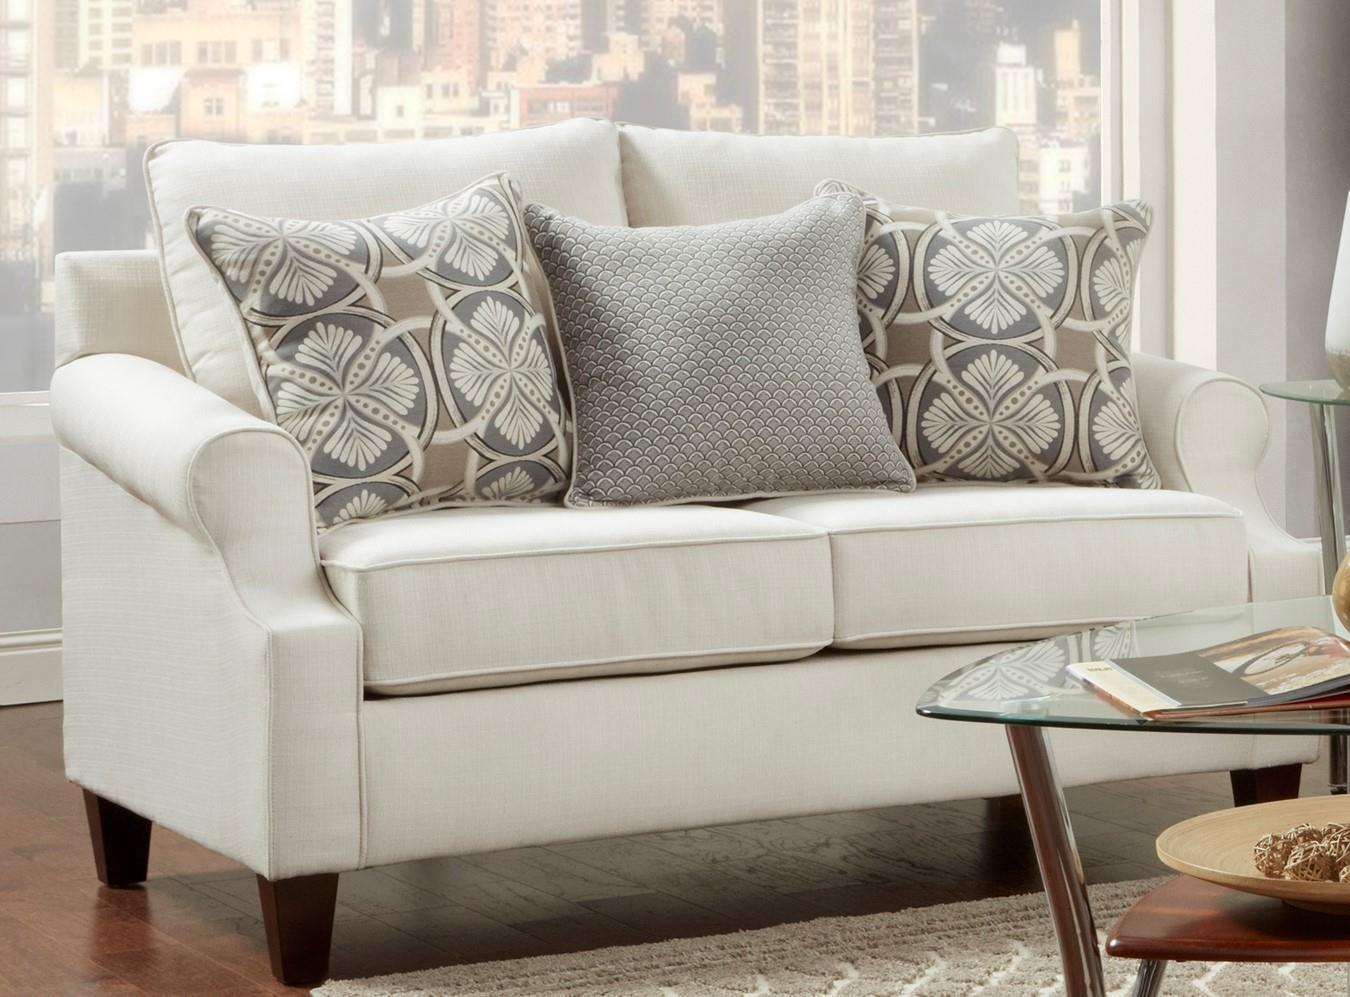 Bay Ridge Bay Ridge Loveseat at Bennett's Furniture and Mattresses